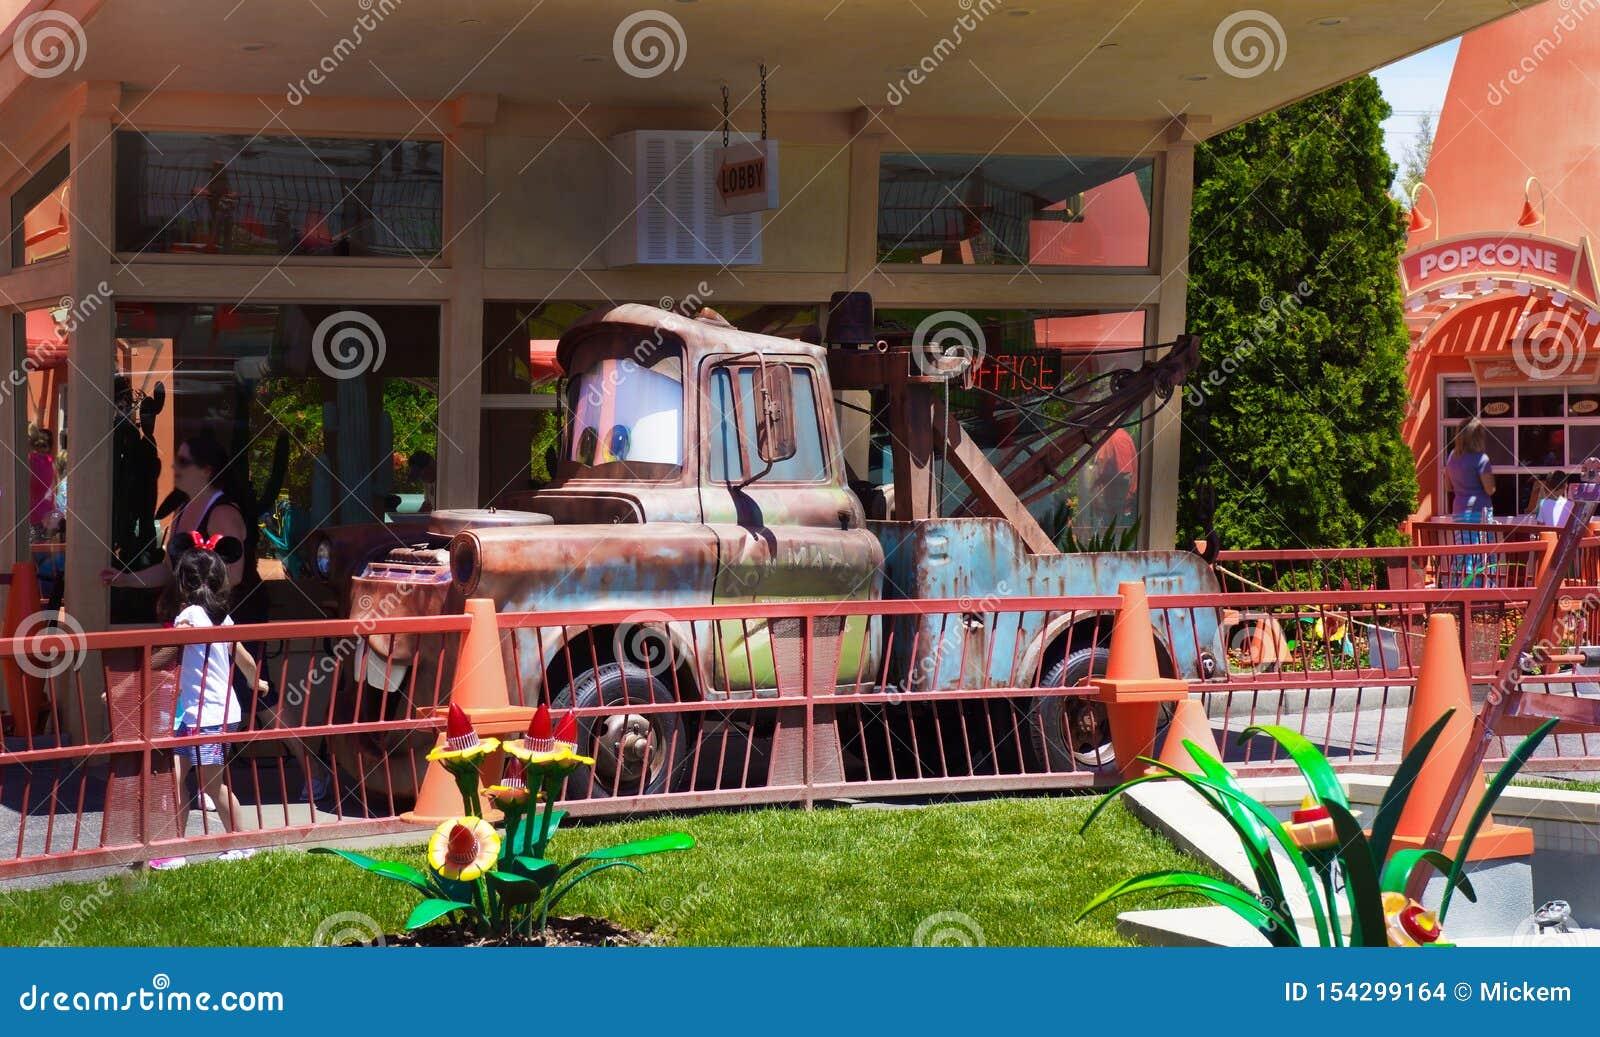 Tow Mater Radiator Springs Disney California Adventure Editorial Stock Image Image Of Childhood Culture 154299164